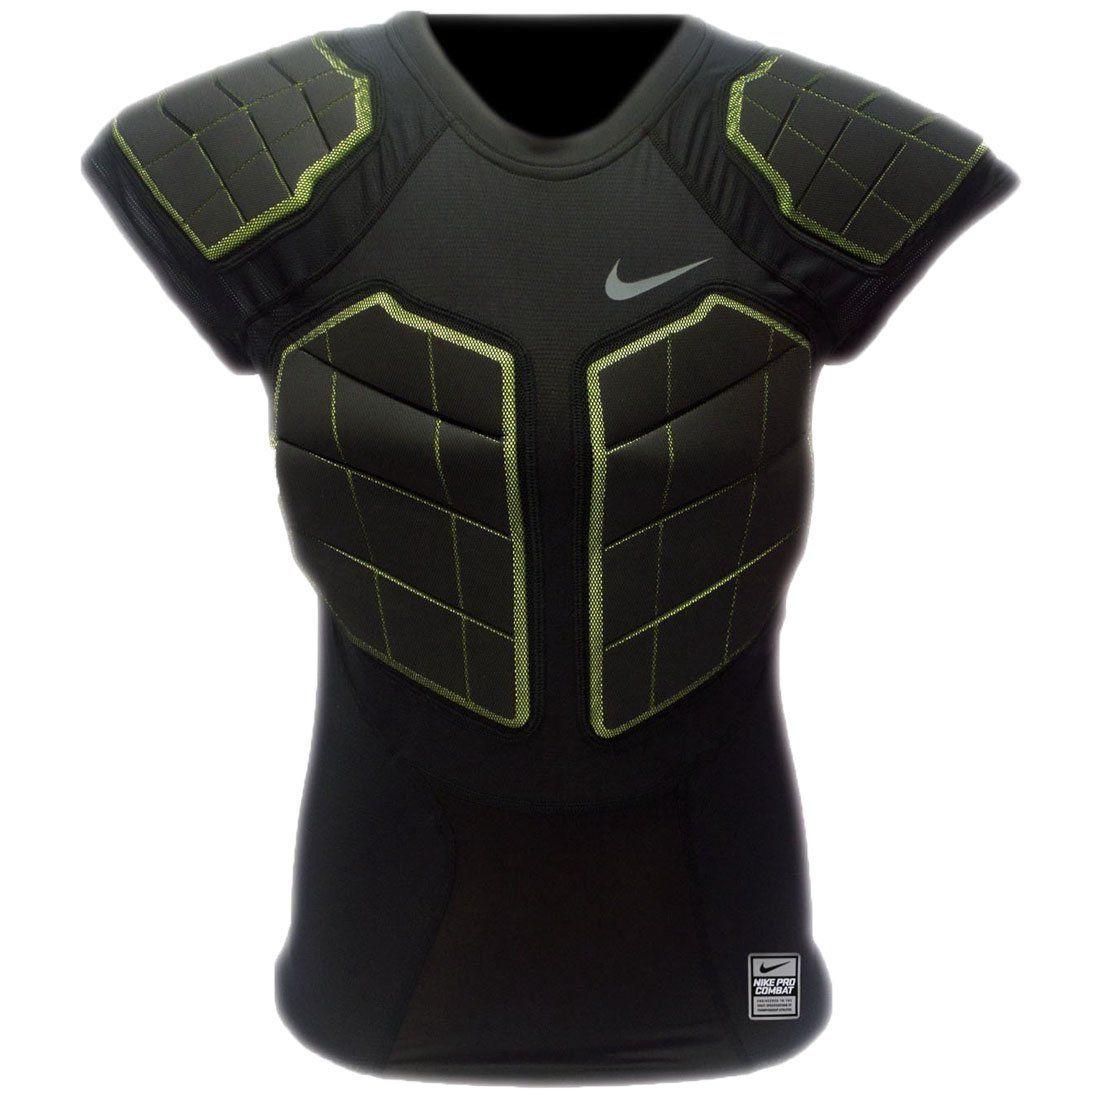 Nike Pro Combat Hyperstrong Men S 4 Pad Compression Shirt Padded Compression Shirt Athletic Apparel Mens Athletic Wear [ 1100 x 1100 Pixel ]